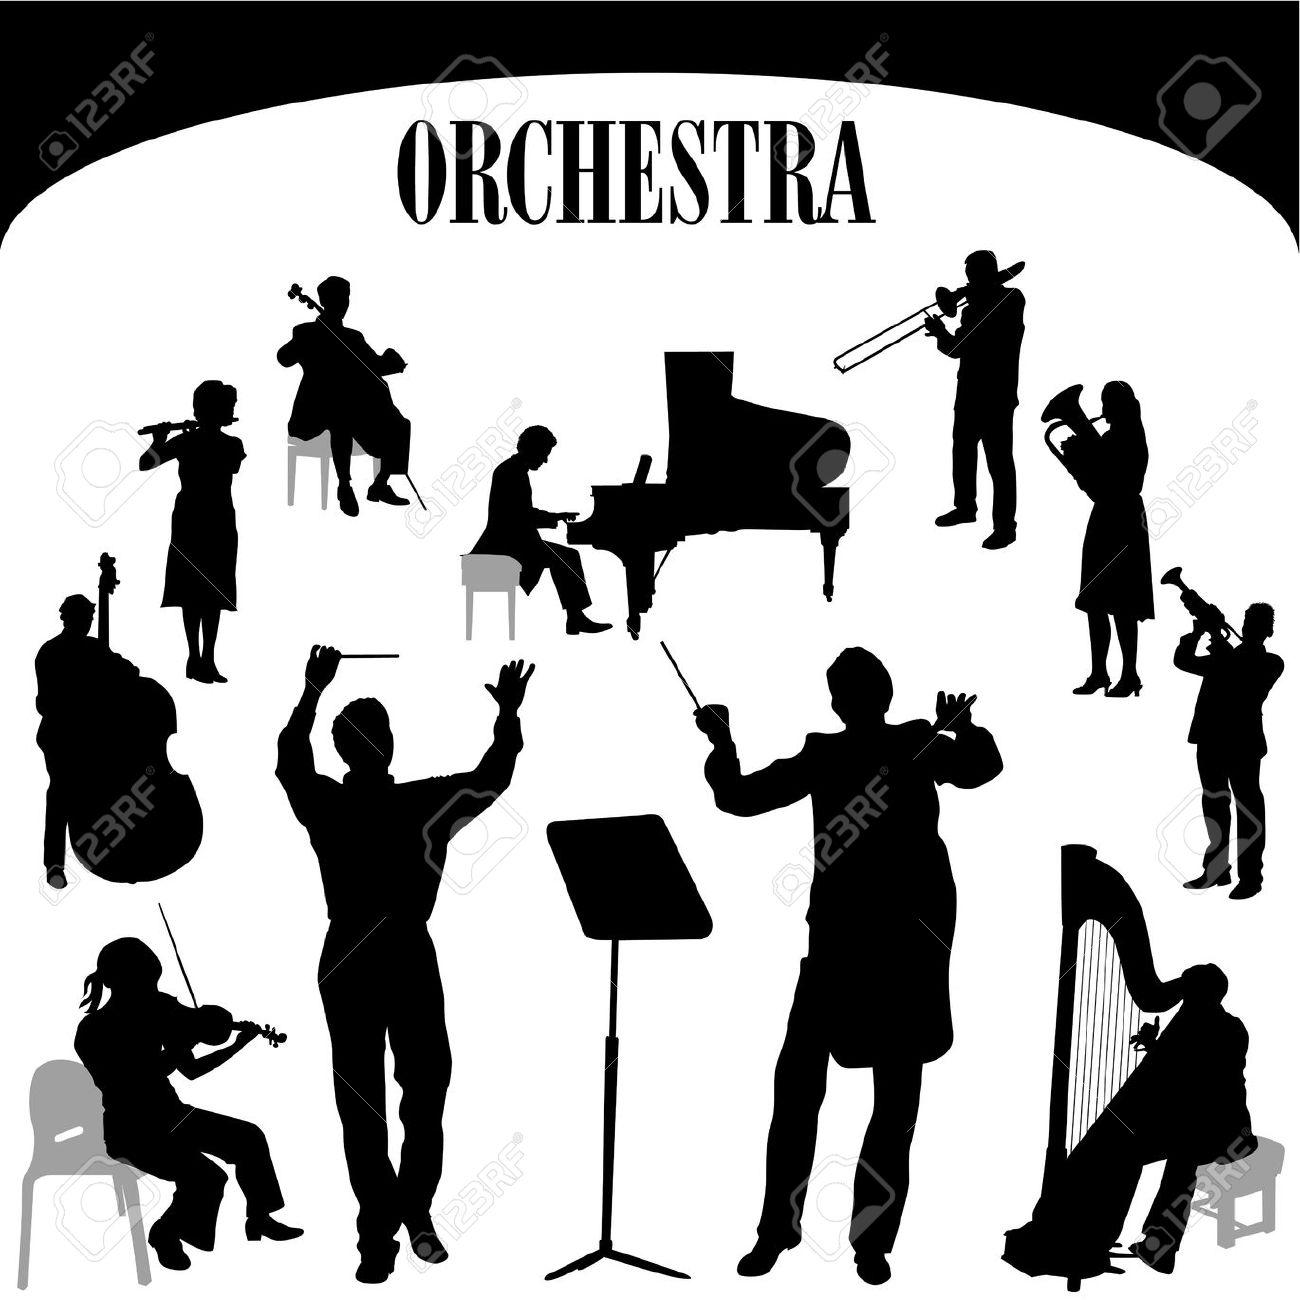 Free Orchestra Cliparts, Download Free Clip Art, Free Clip.